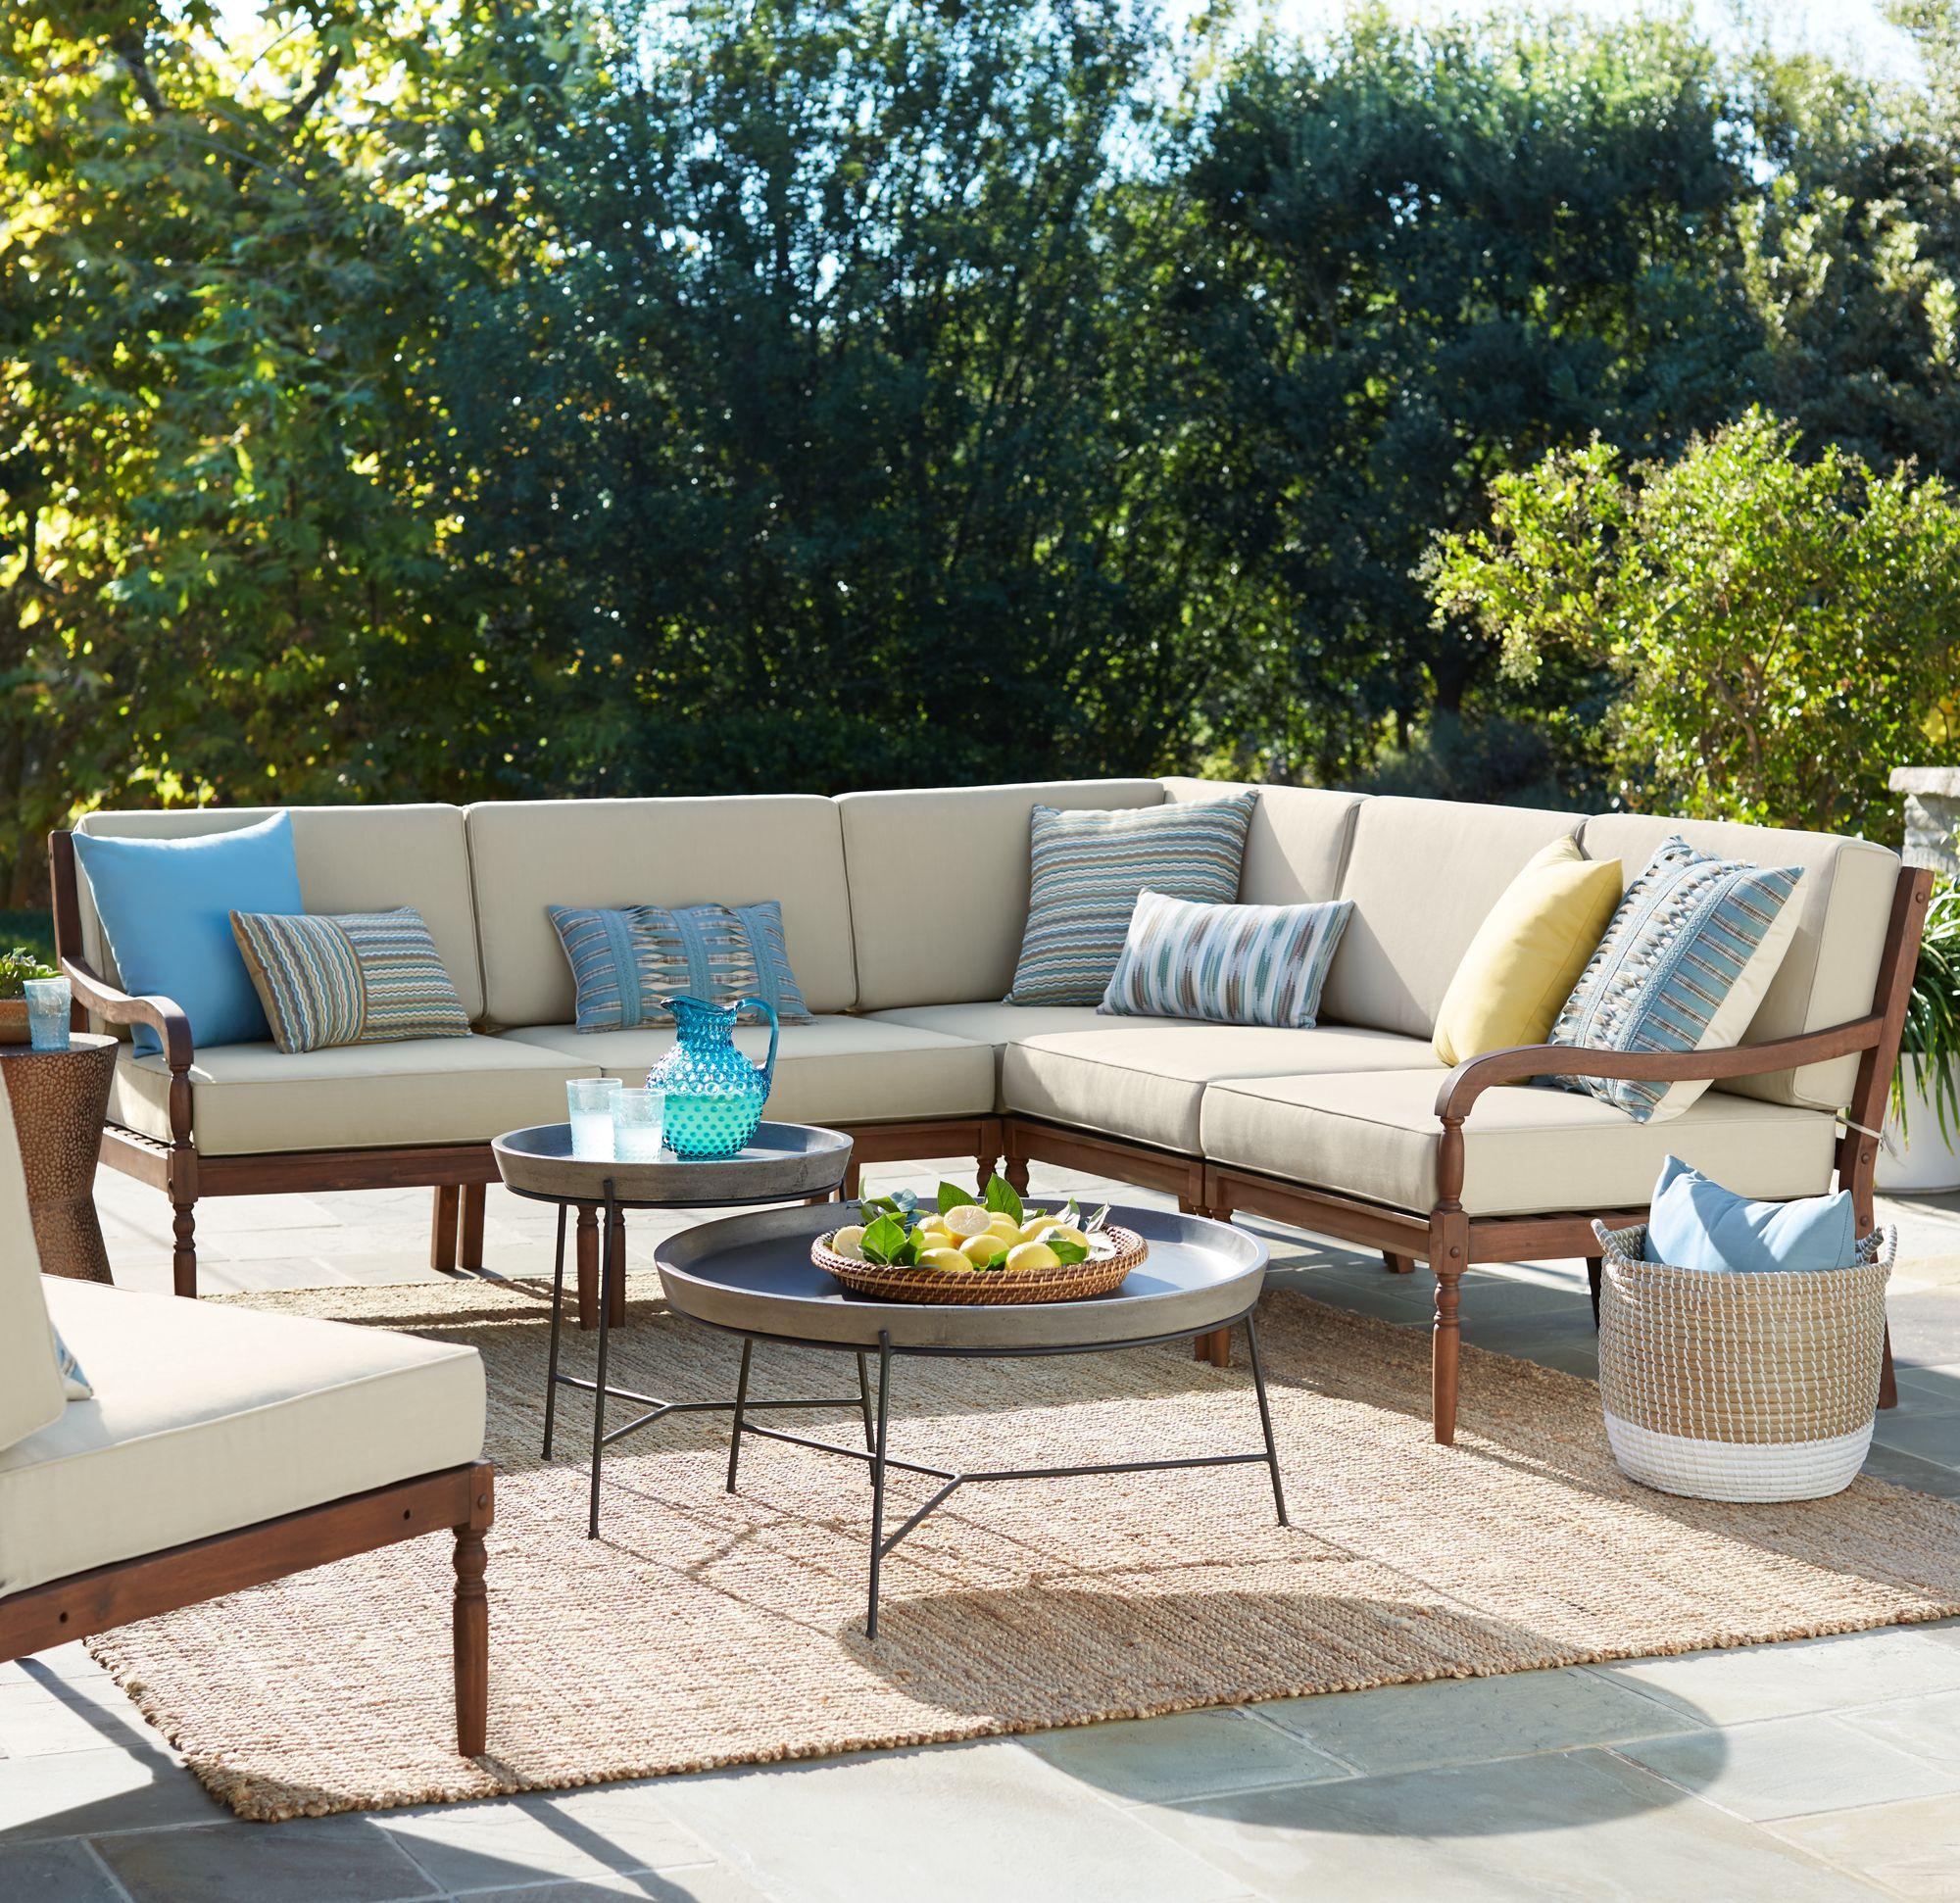 outdoor patio sets napa modular acacia wood 5-piece outdoor seating patio set DHUYRET